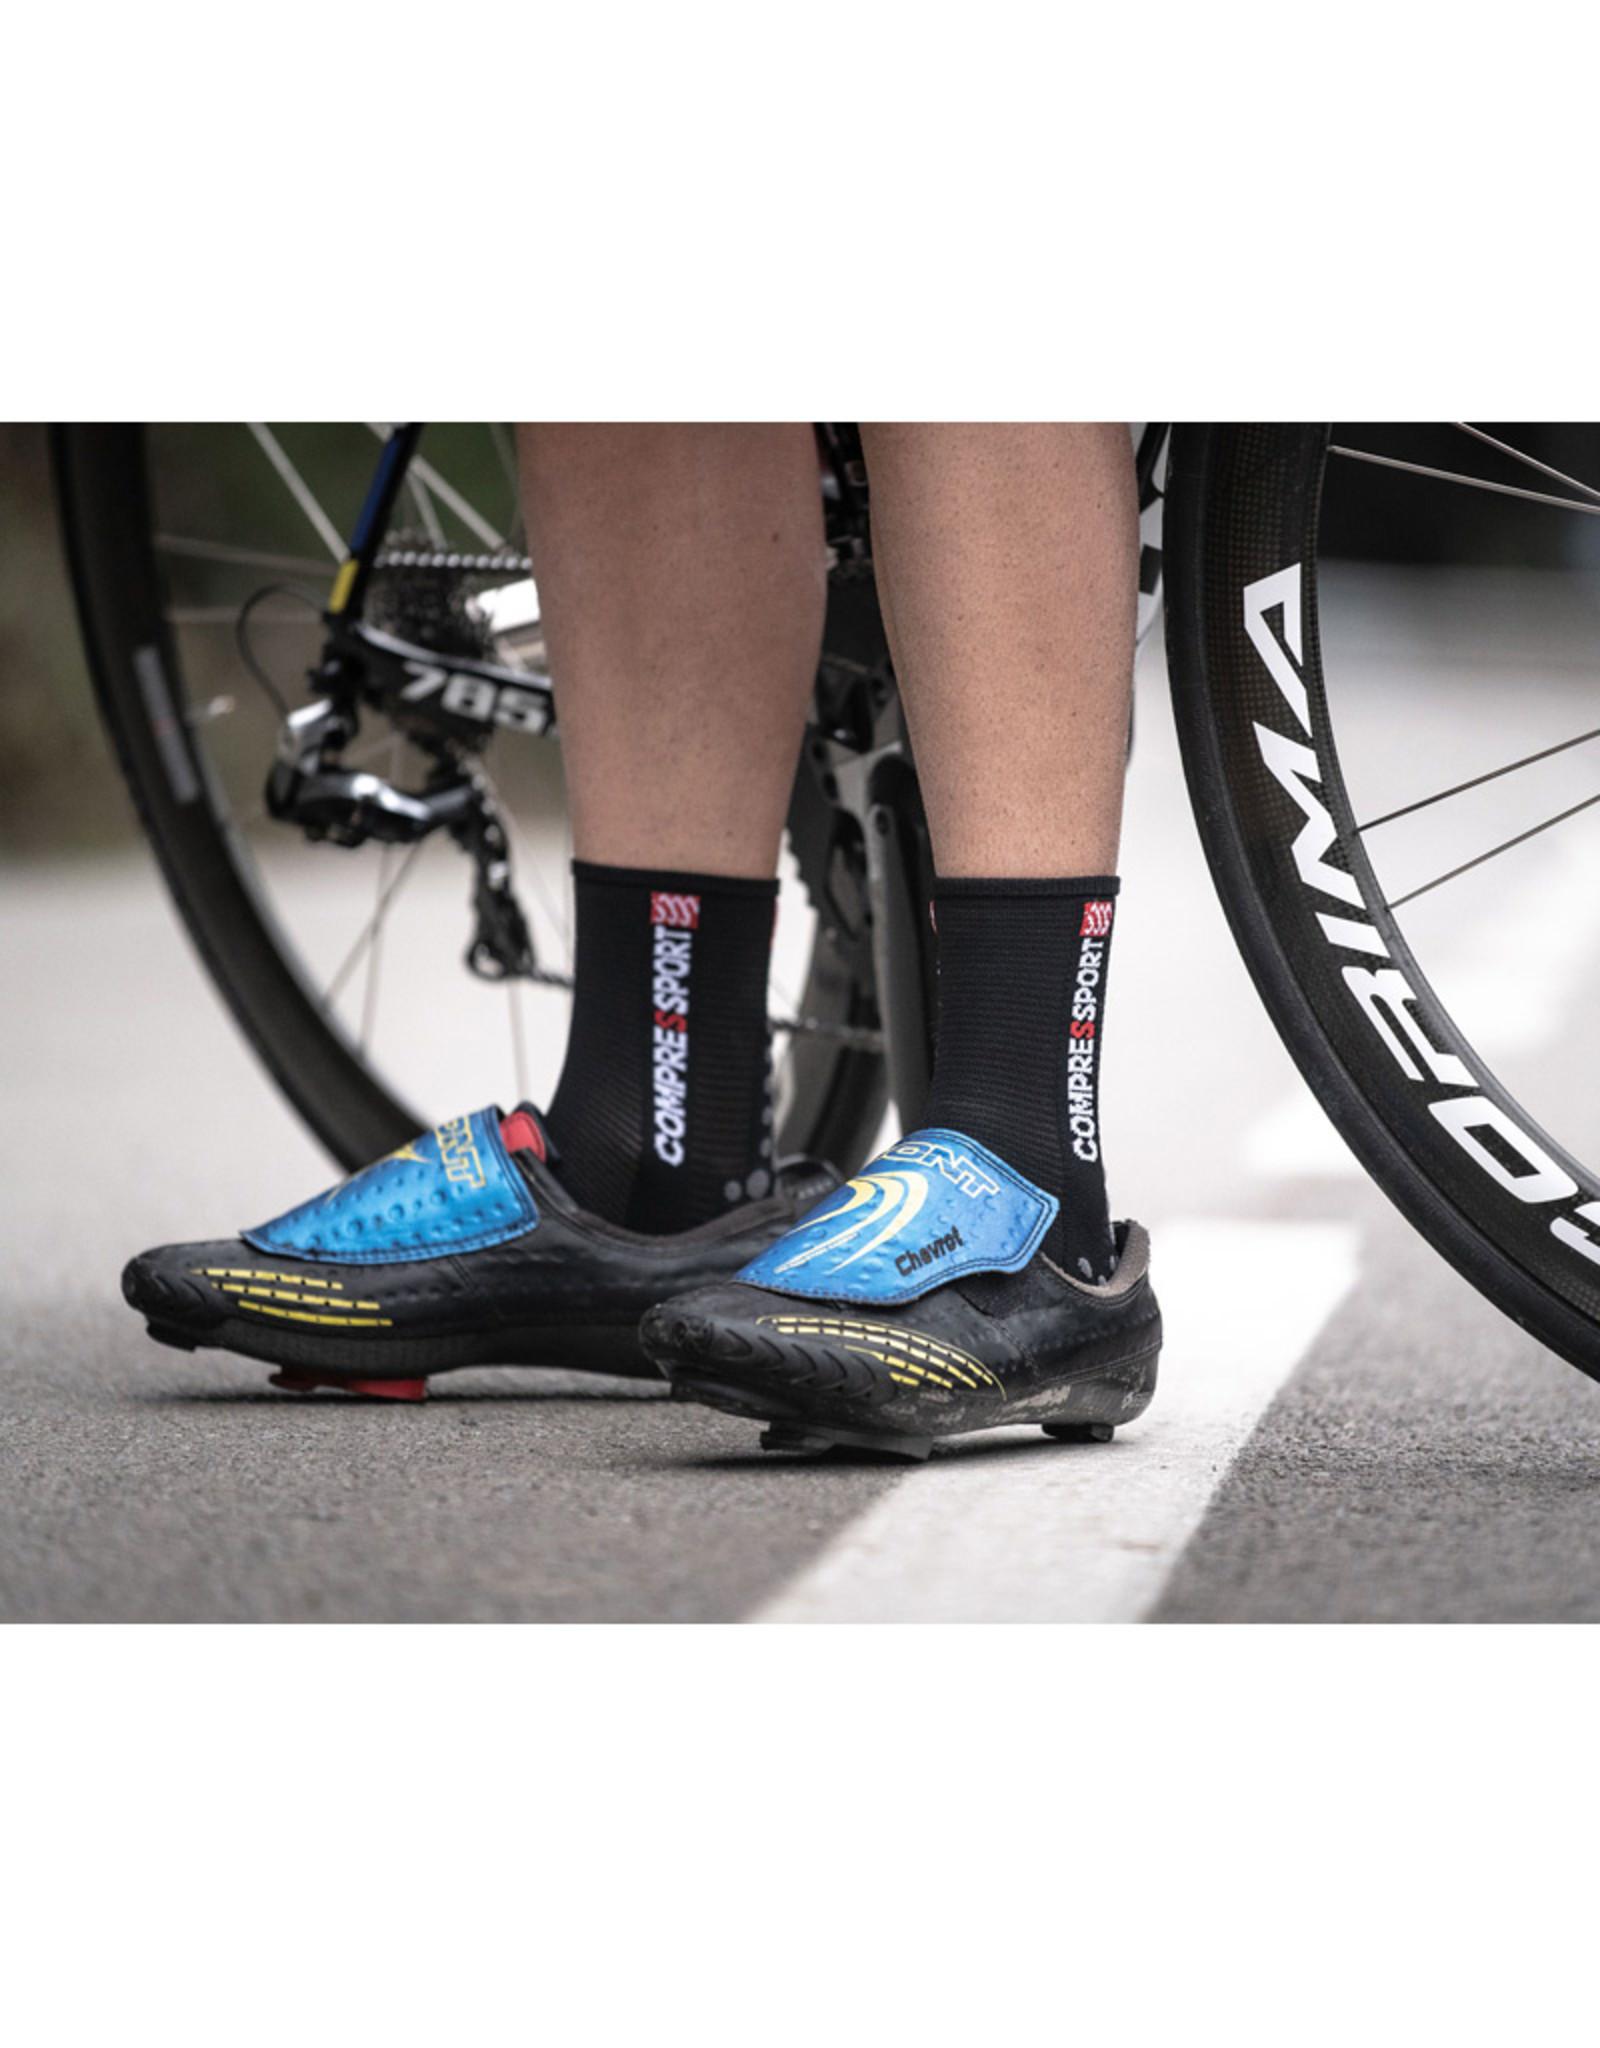 Compressport Pro Racing Socks V3.0 Bike Fietssokken - Zwart